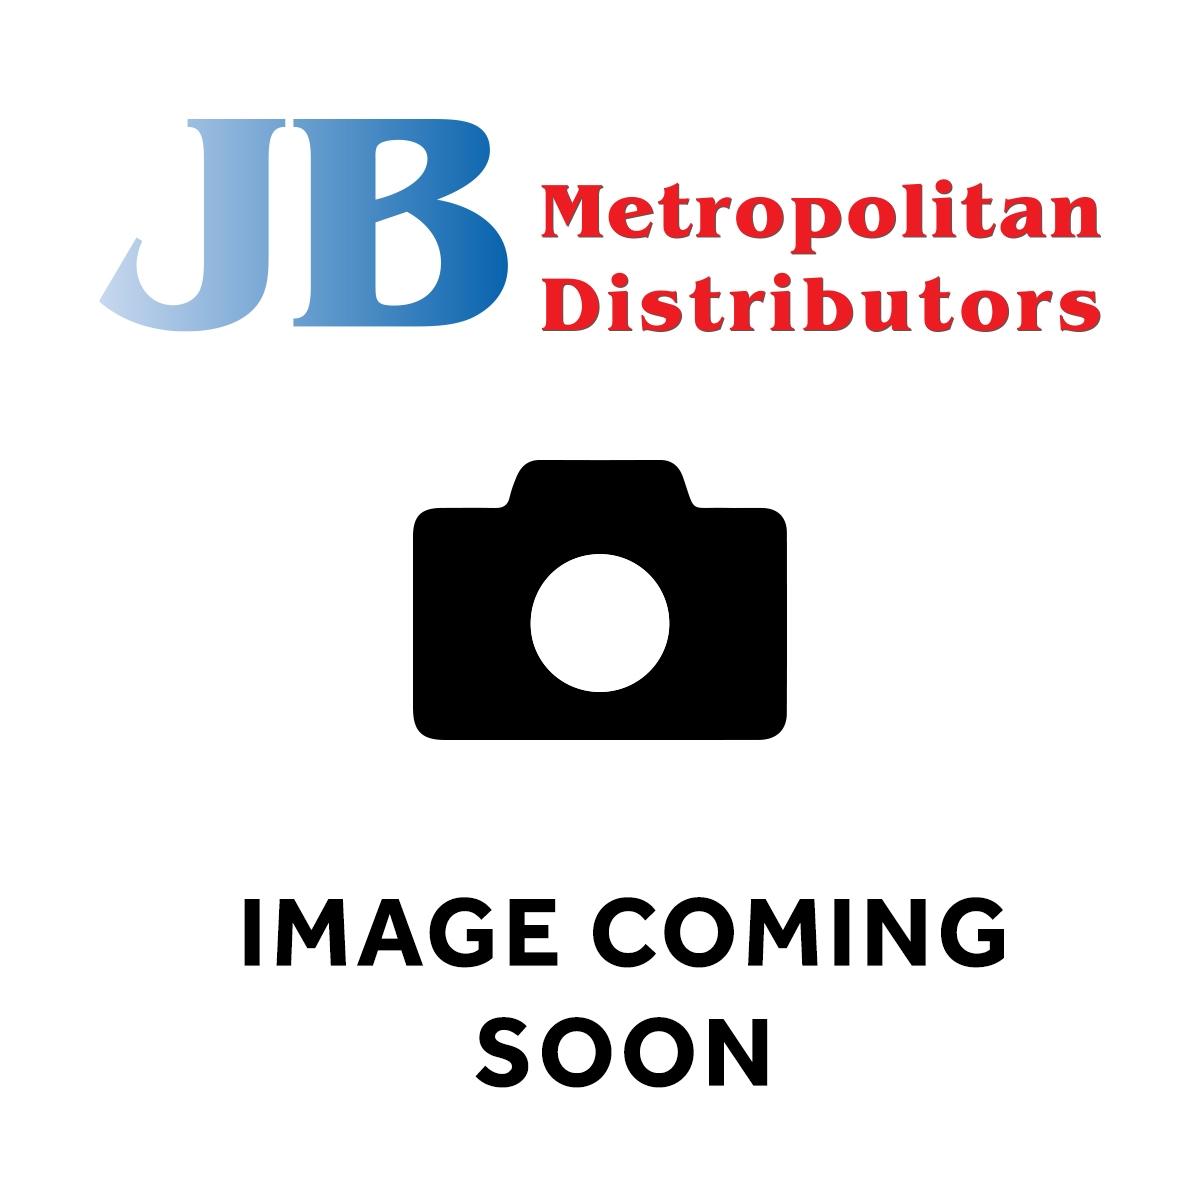 100G TOBLERONE MILK